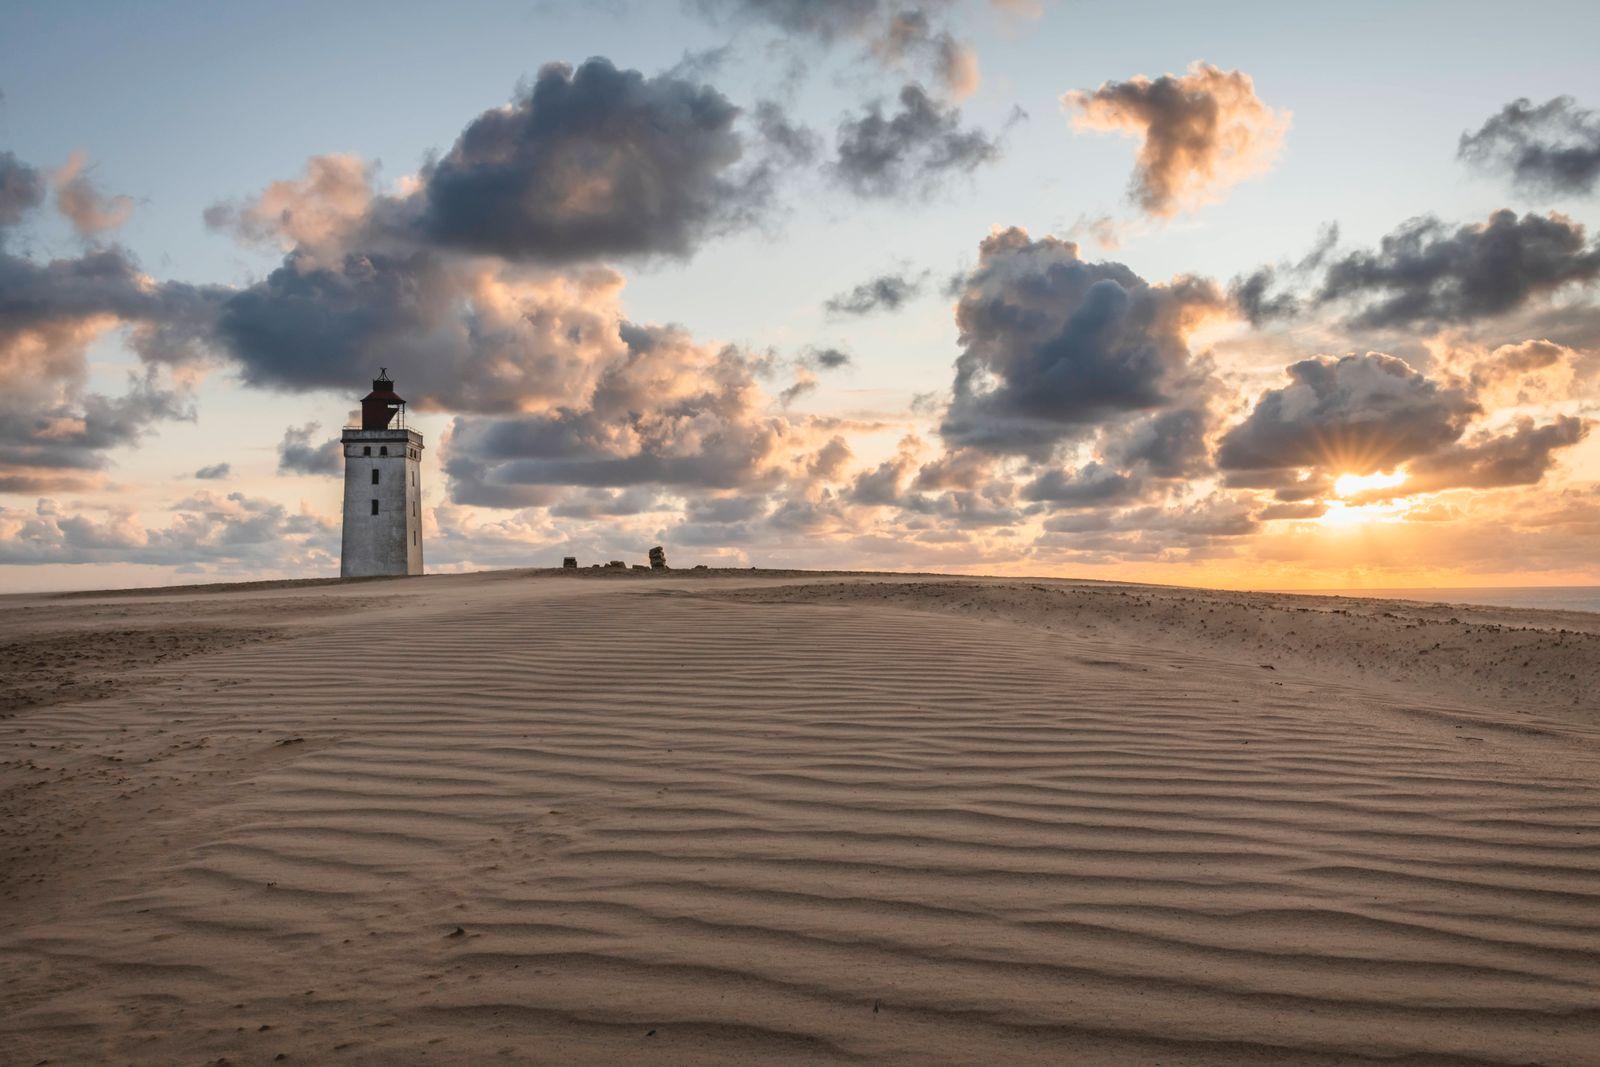 Denmark, Lonstrup, Clouds over rippled sand dunes and Rubjerg Knude Lighthouse at sunset PUBLICATIONxINxGERxSUIxAUTxHUNx